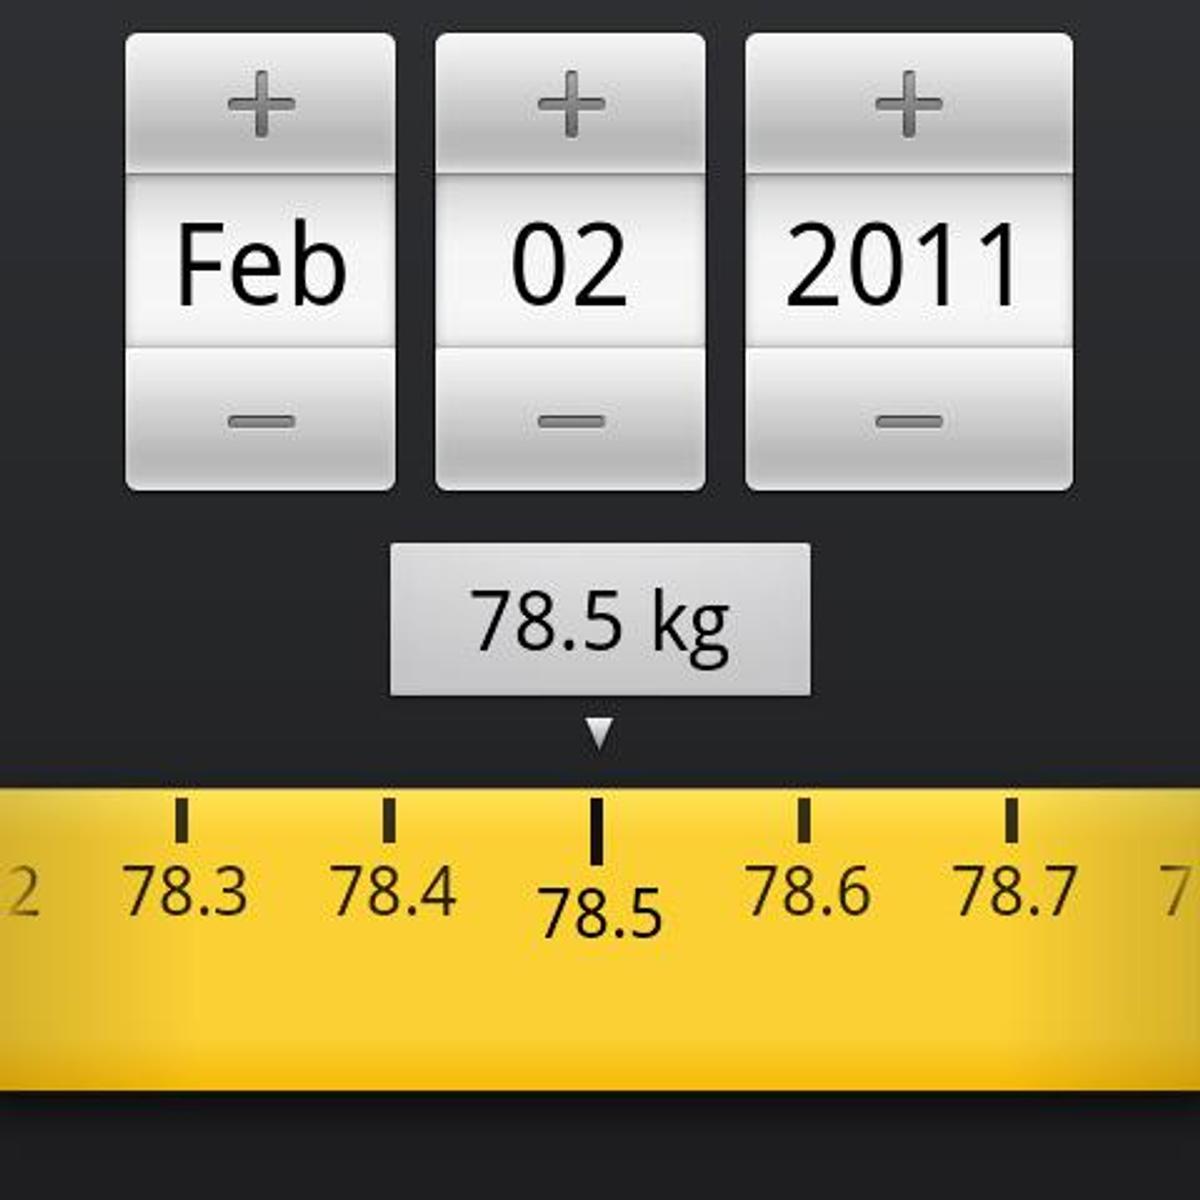 libra weight loss app